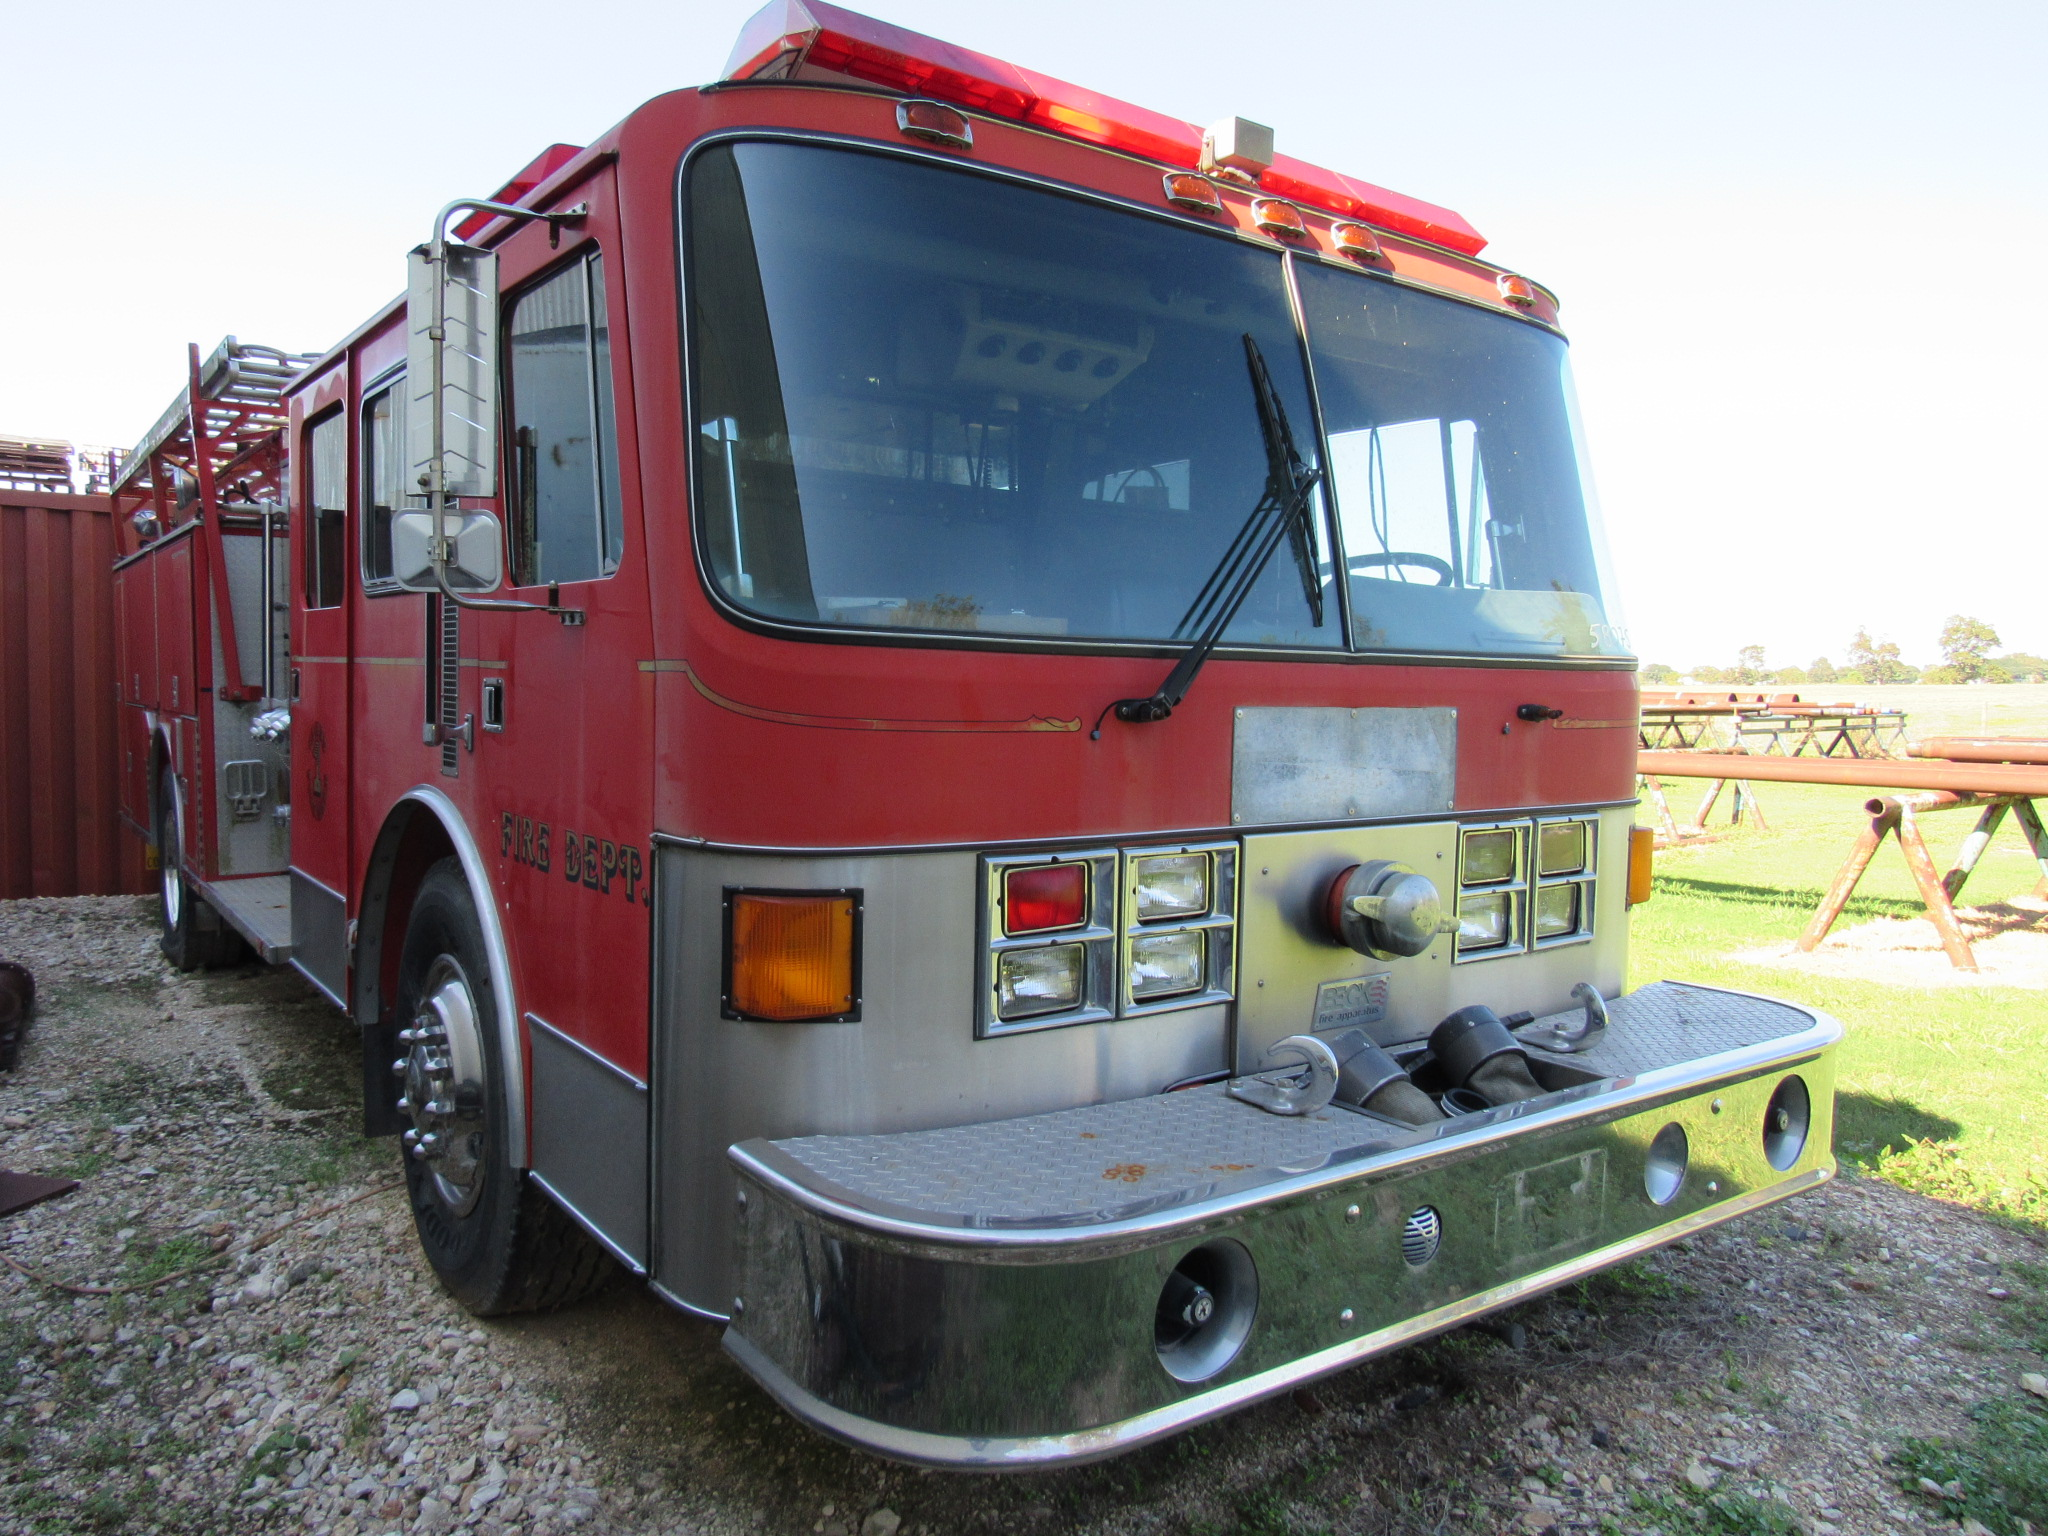 Ottawa / Beck Fire Truck - Image 4 of 6